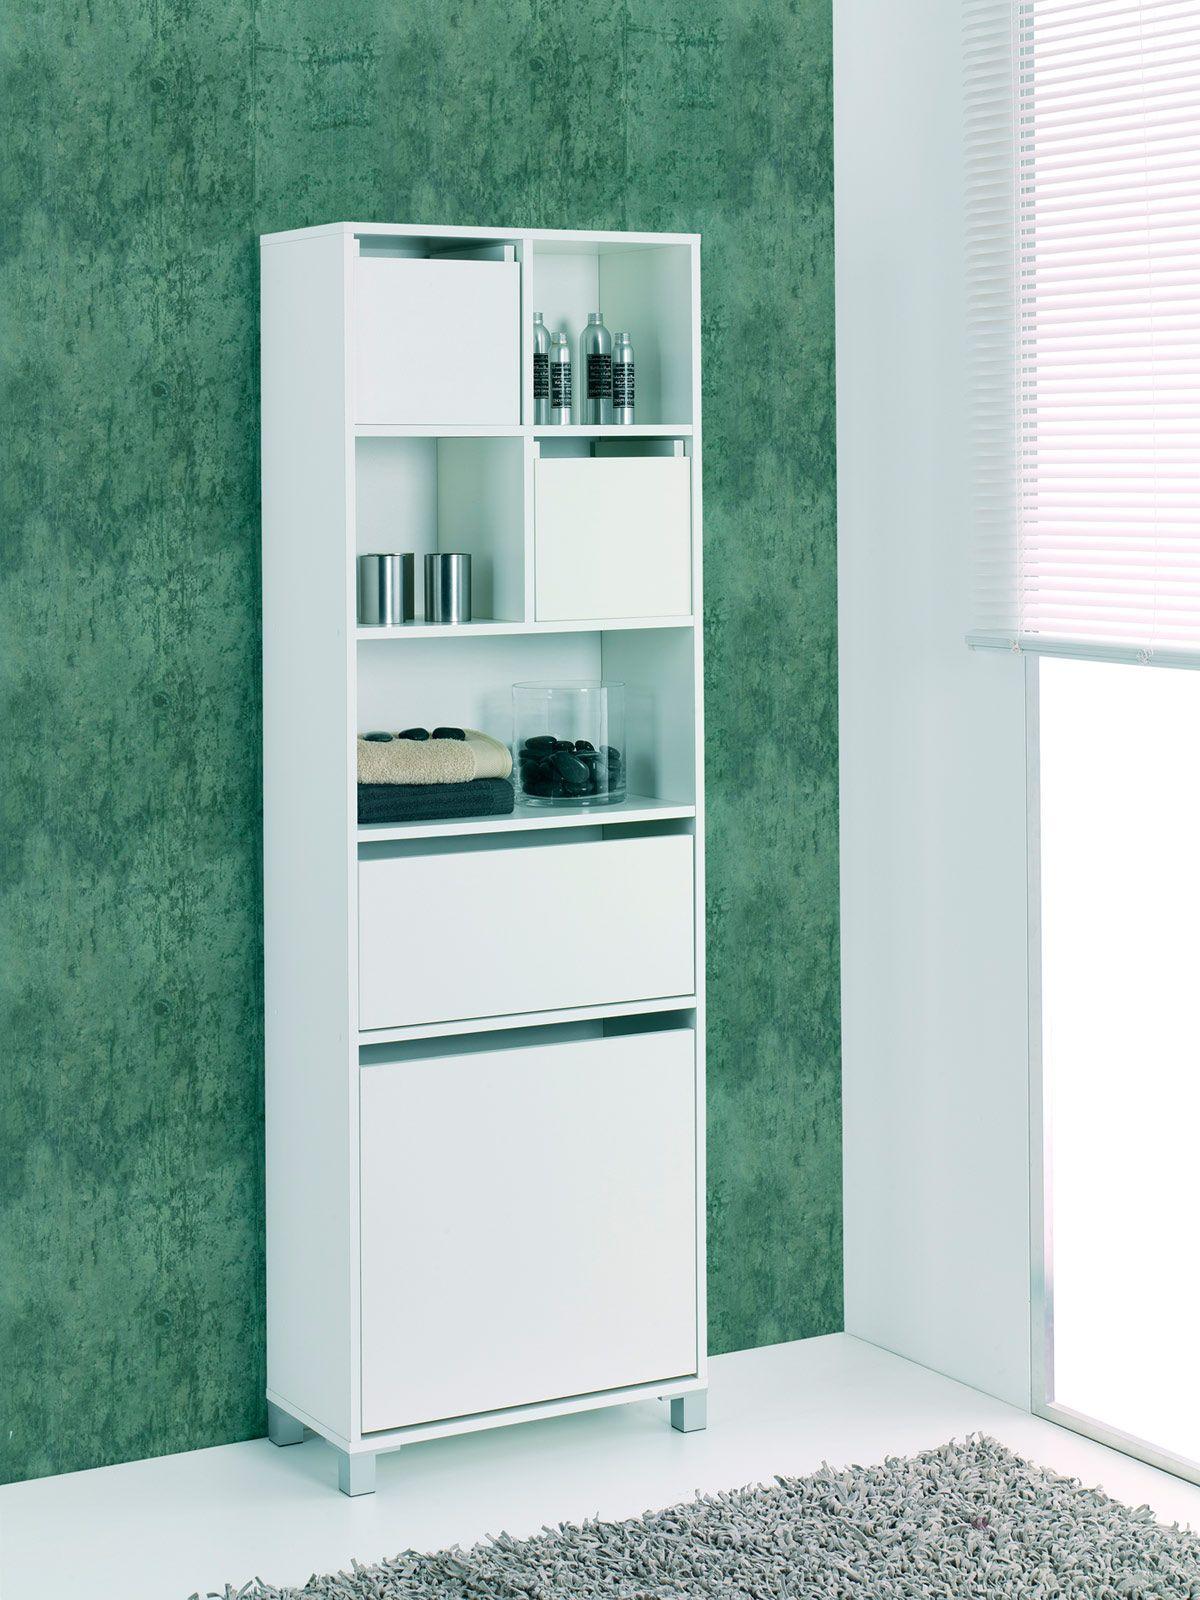 Ofertas de muebles online good muebles with ofertas de for Muebles ofertas online